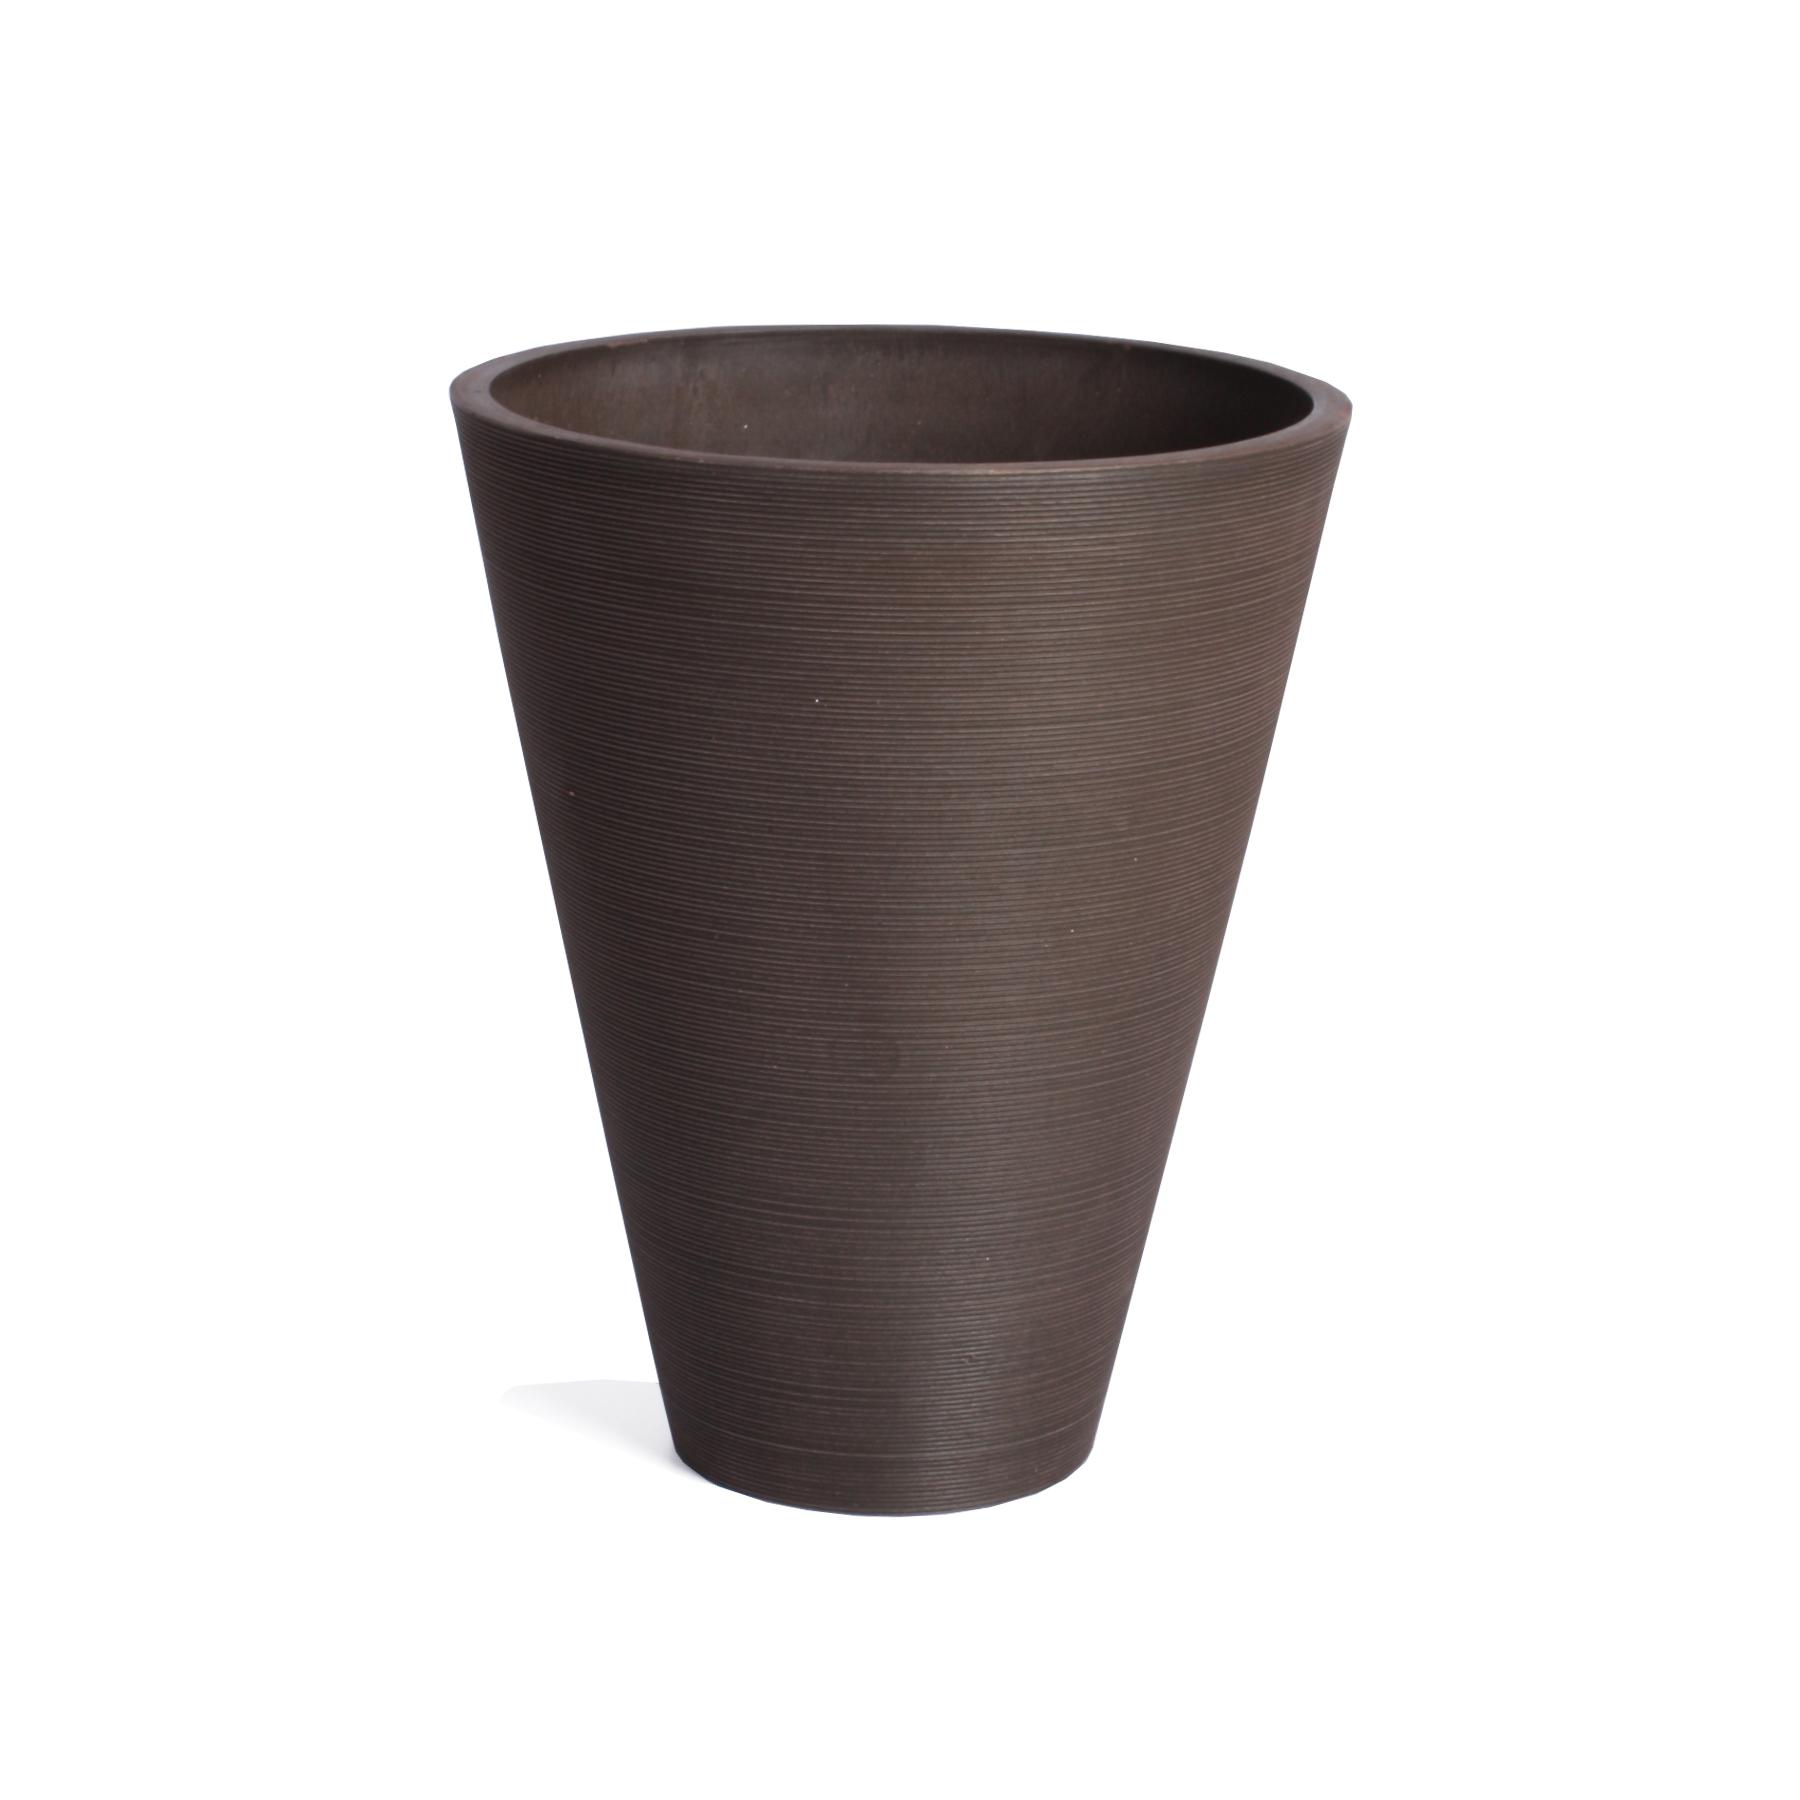 14 inch Veradek Kobo Round Planter (Espresso) $15 + Free shipping w/ $35